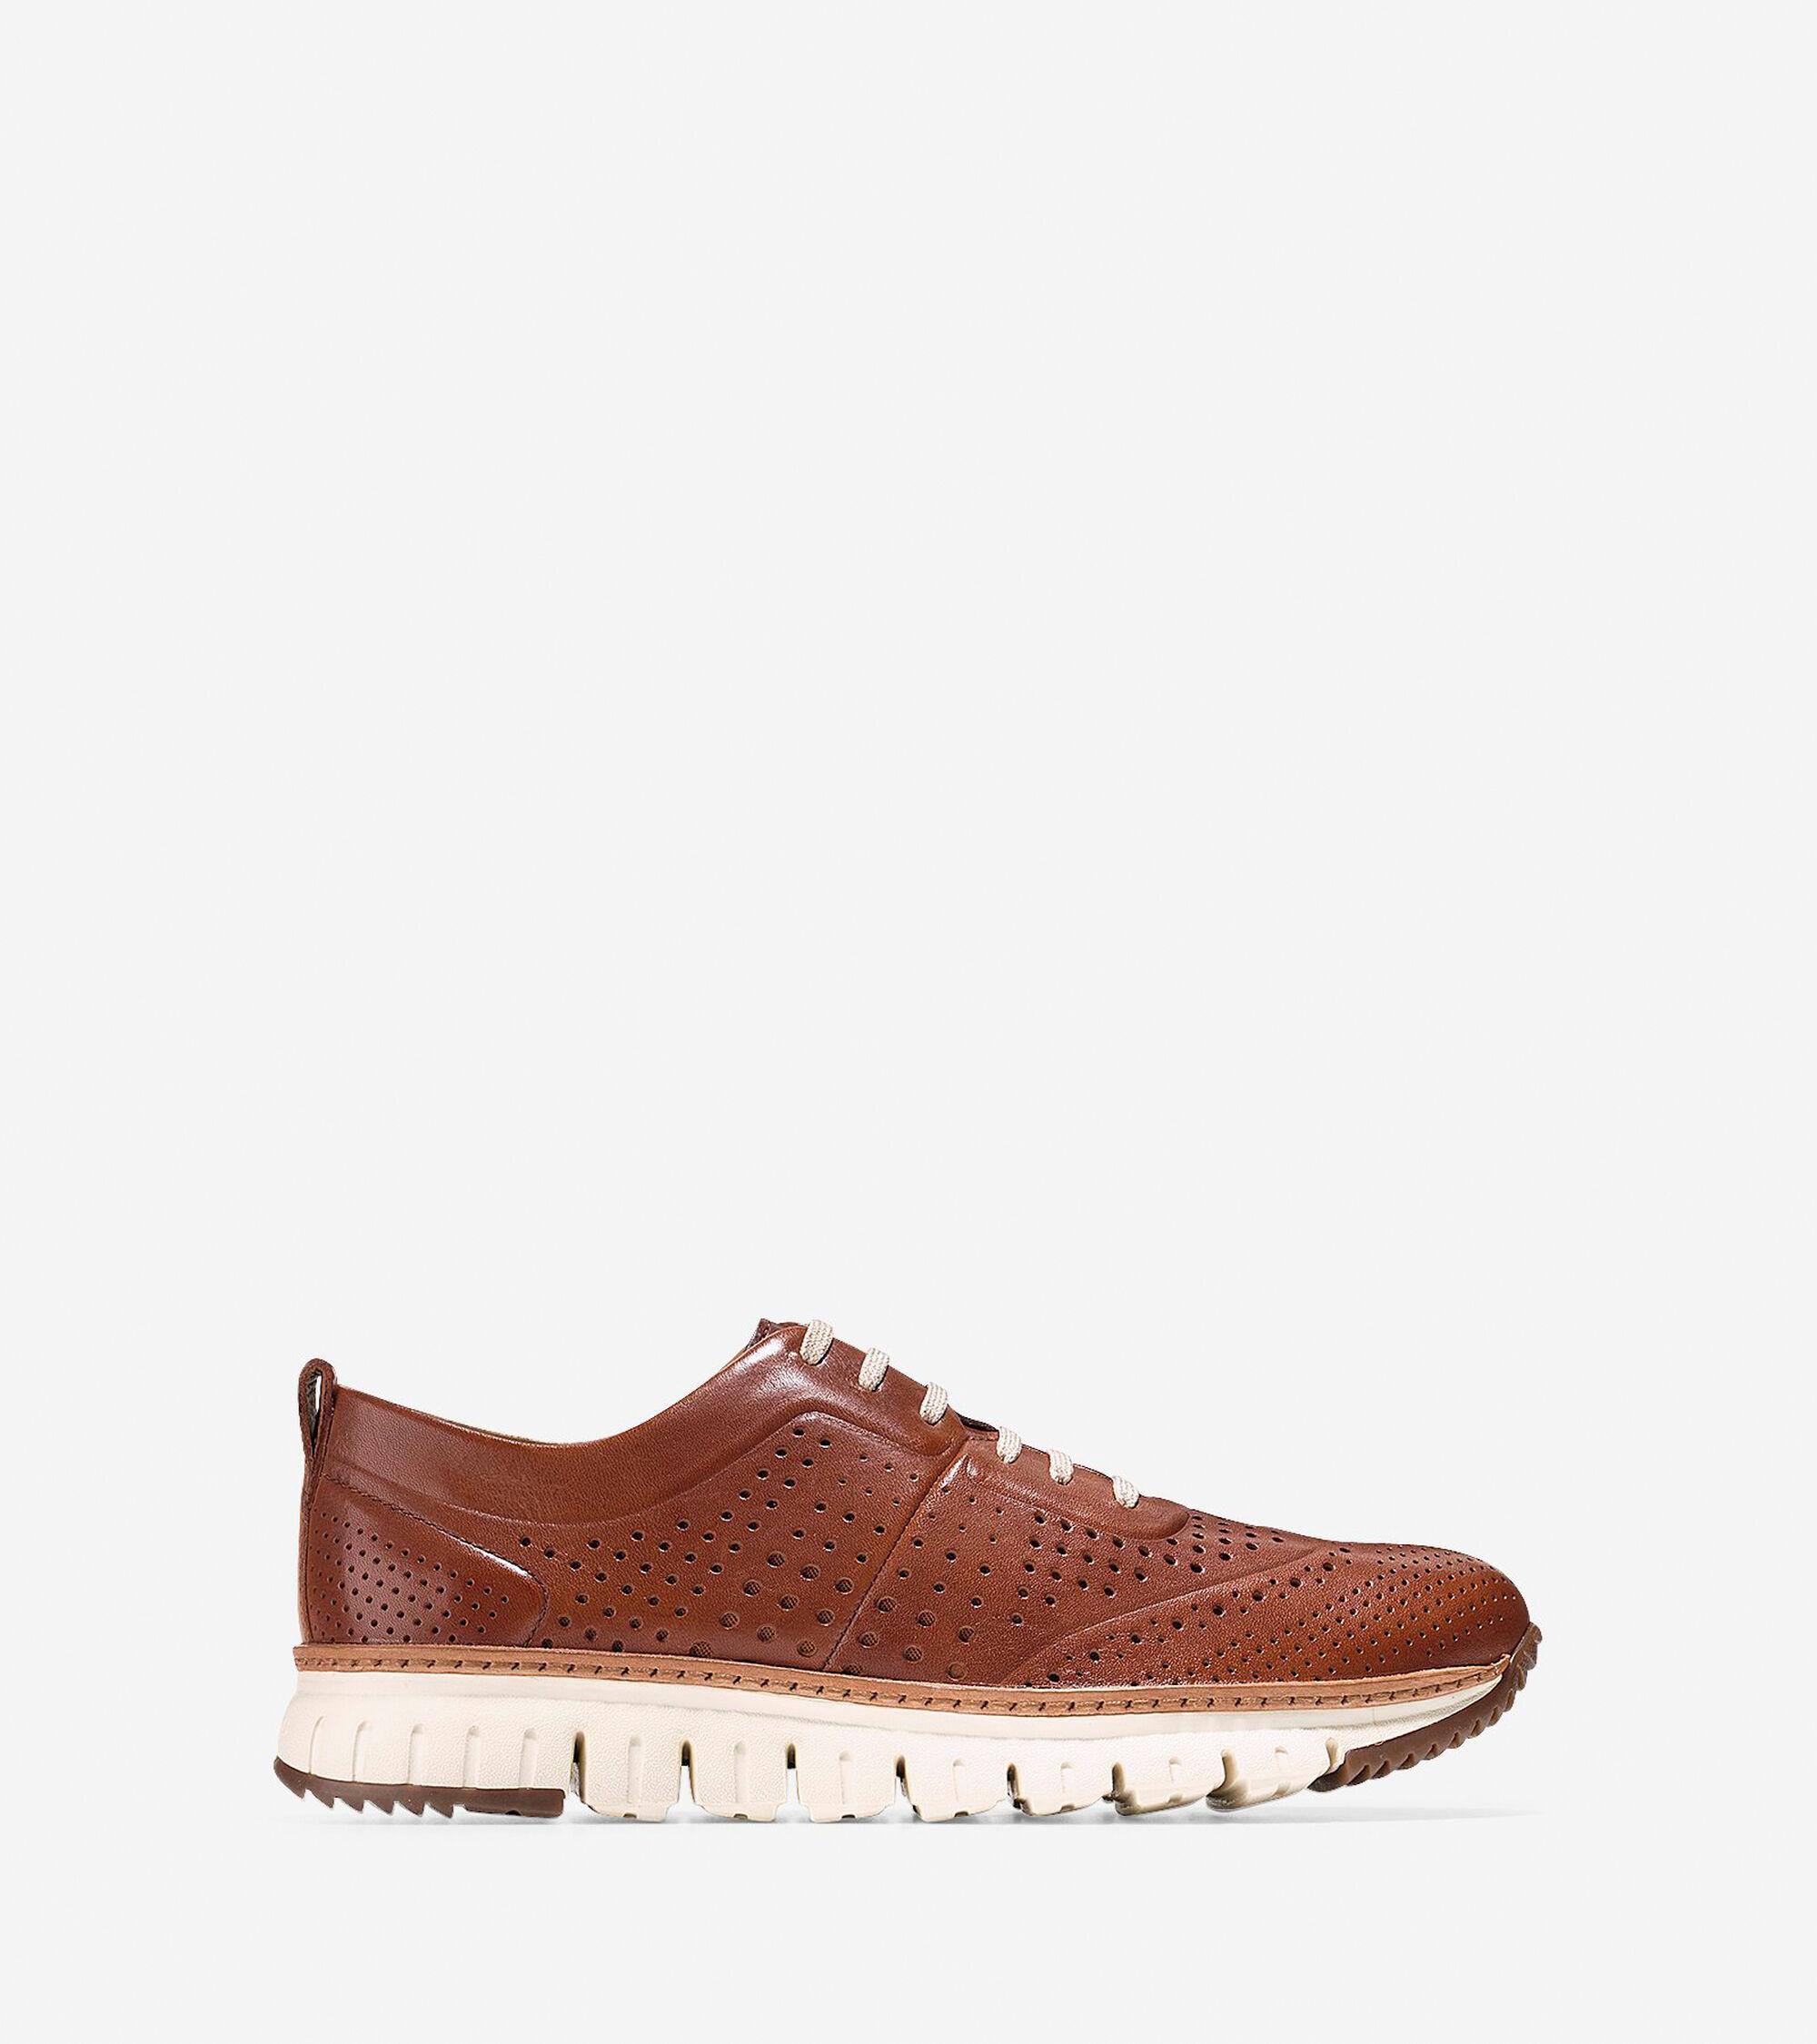 Cole Haan ZEROGRAND Perforated Sneaker